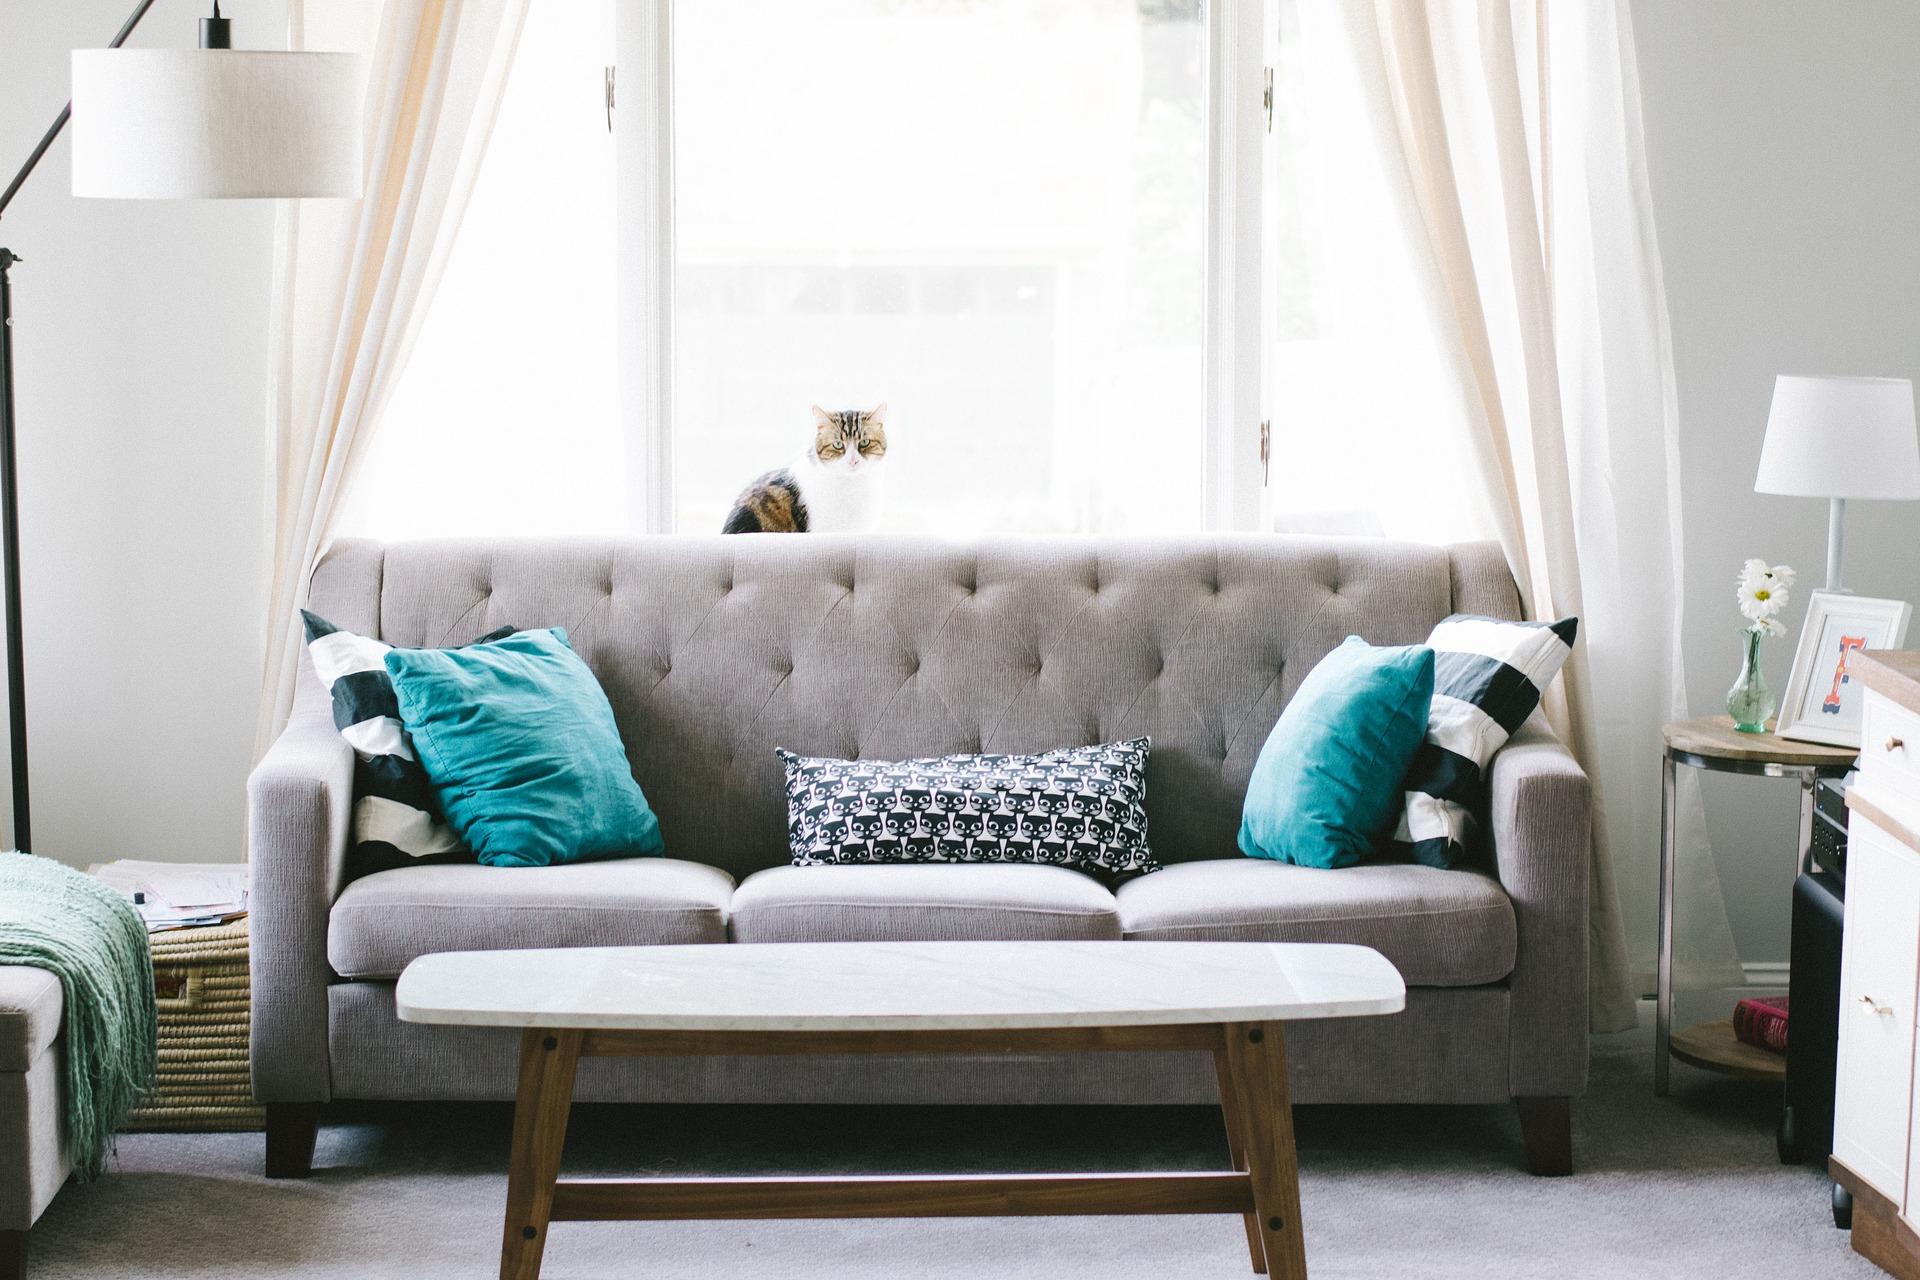 investir-location-meublee-avantages-obligations-bertrand-demanes